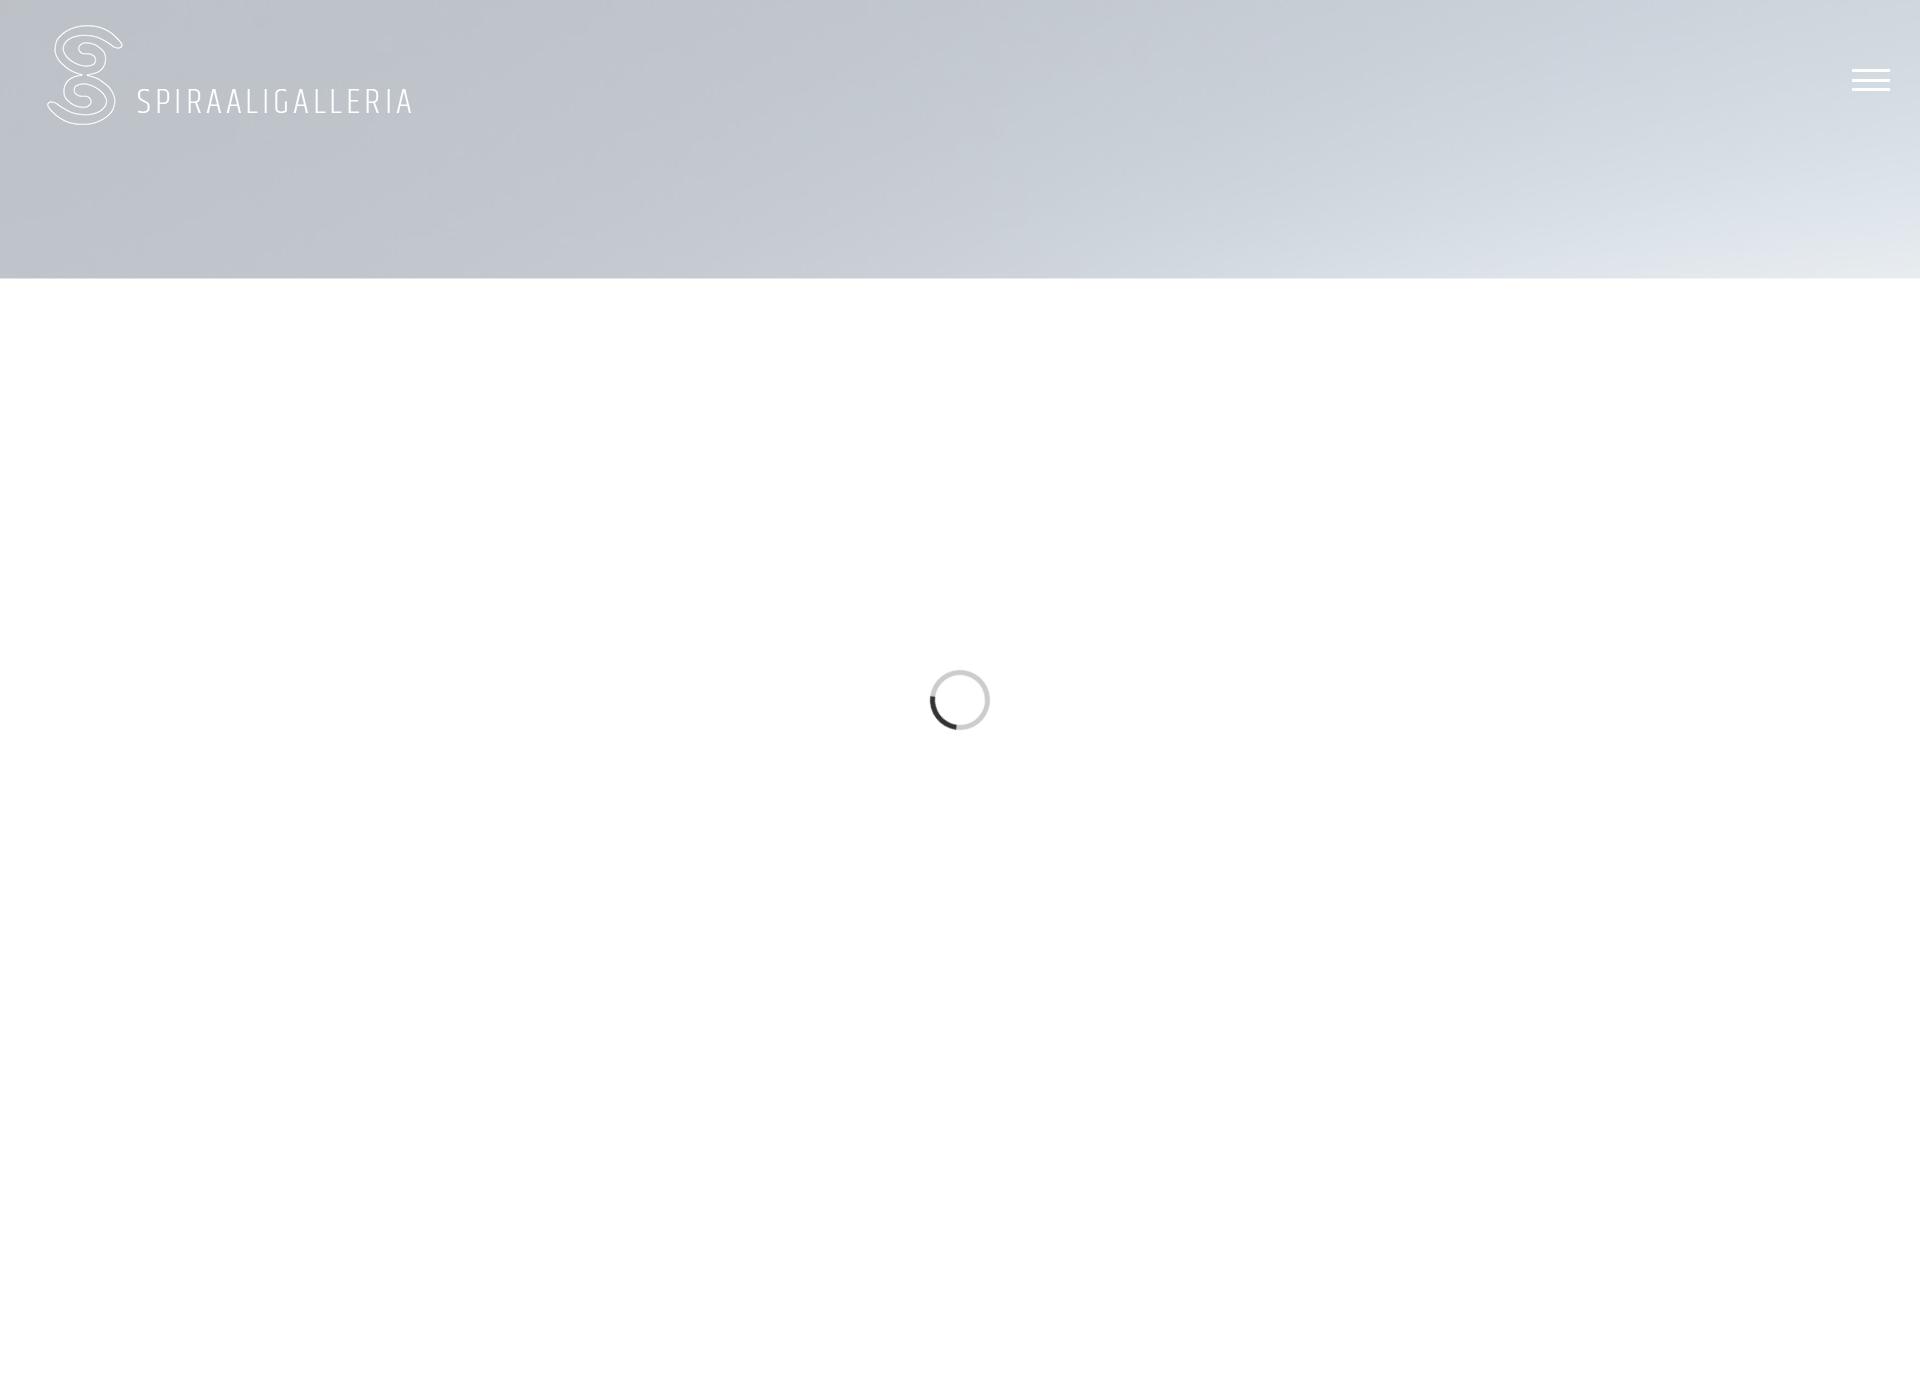 Screenshot for spiraaligalleria.fi